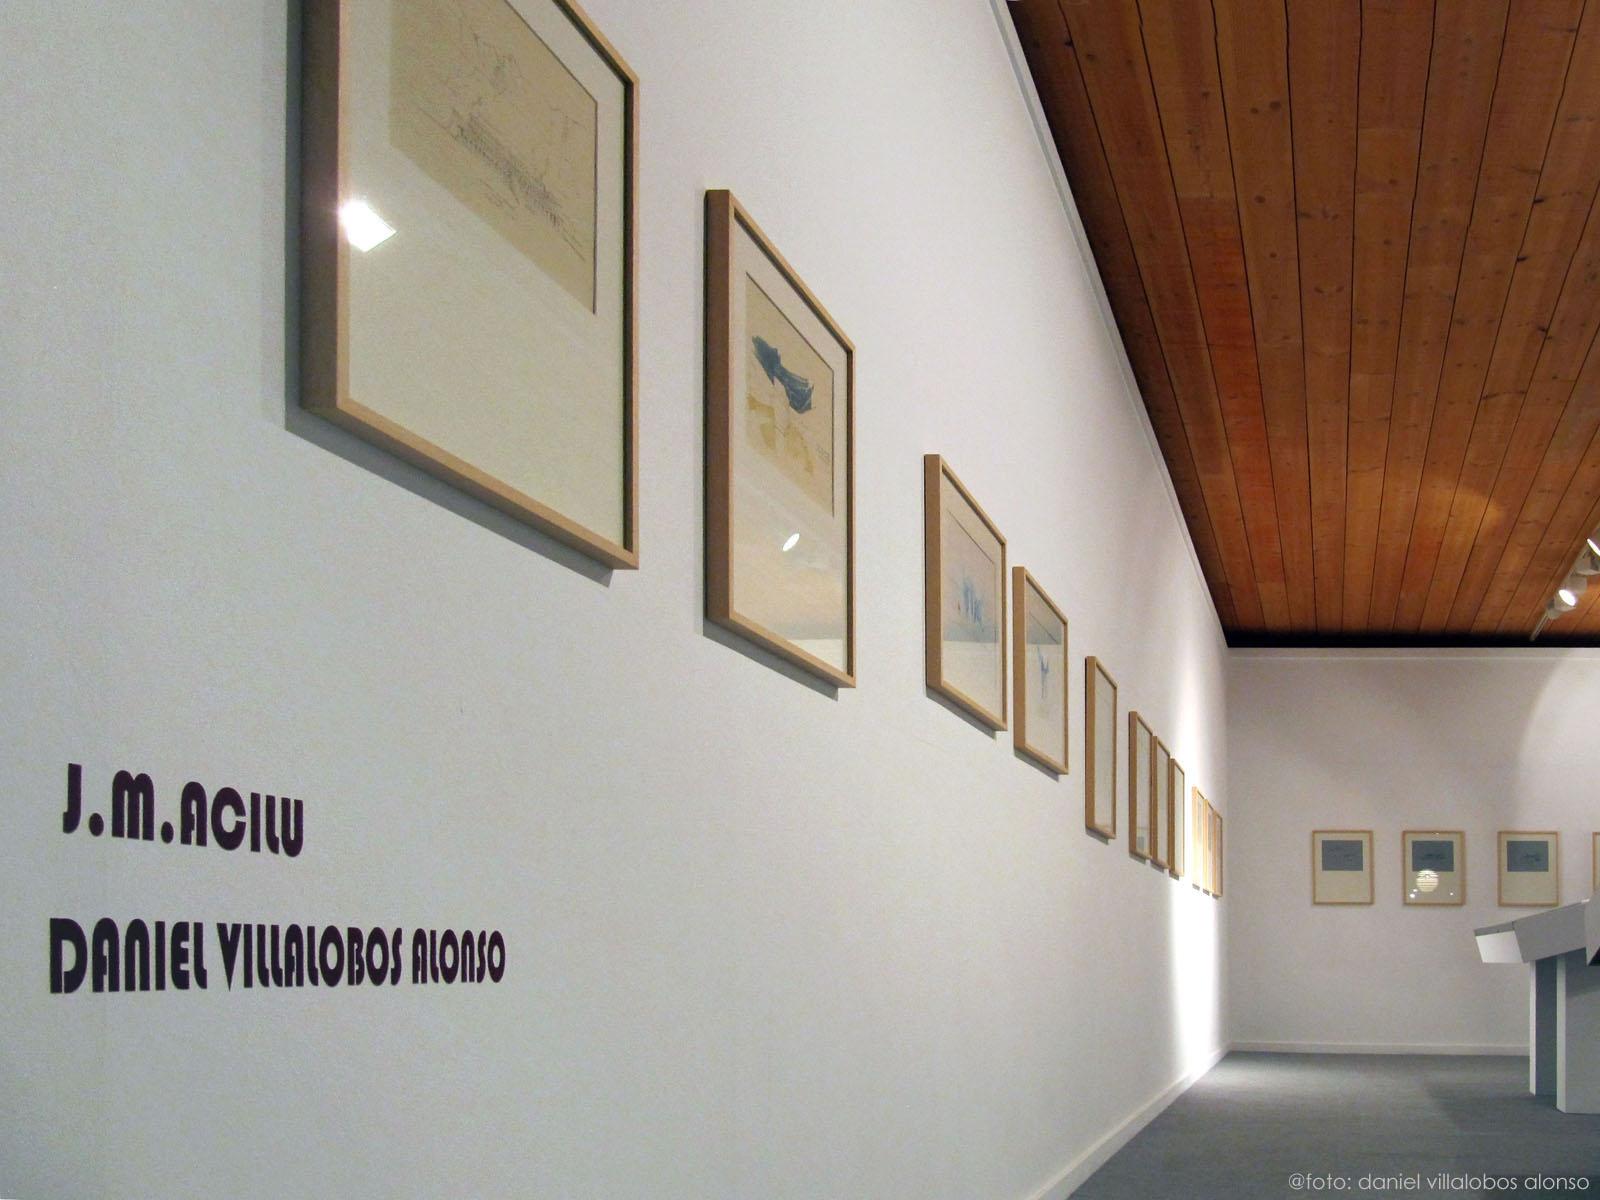 danielvillalobos-miguelelas-josmaraacilu-sketchbooks-skechtravelsexhibition-6